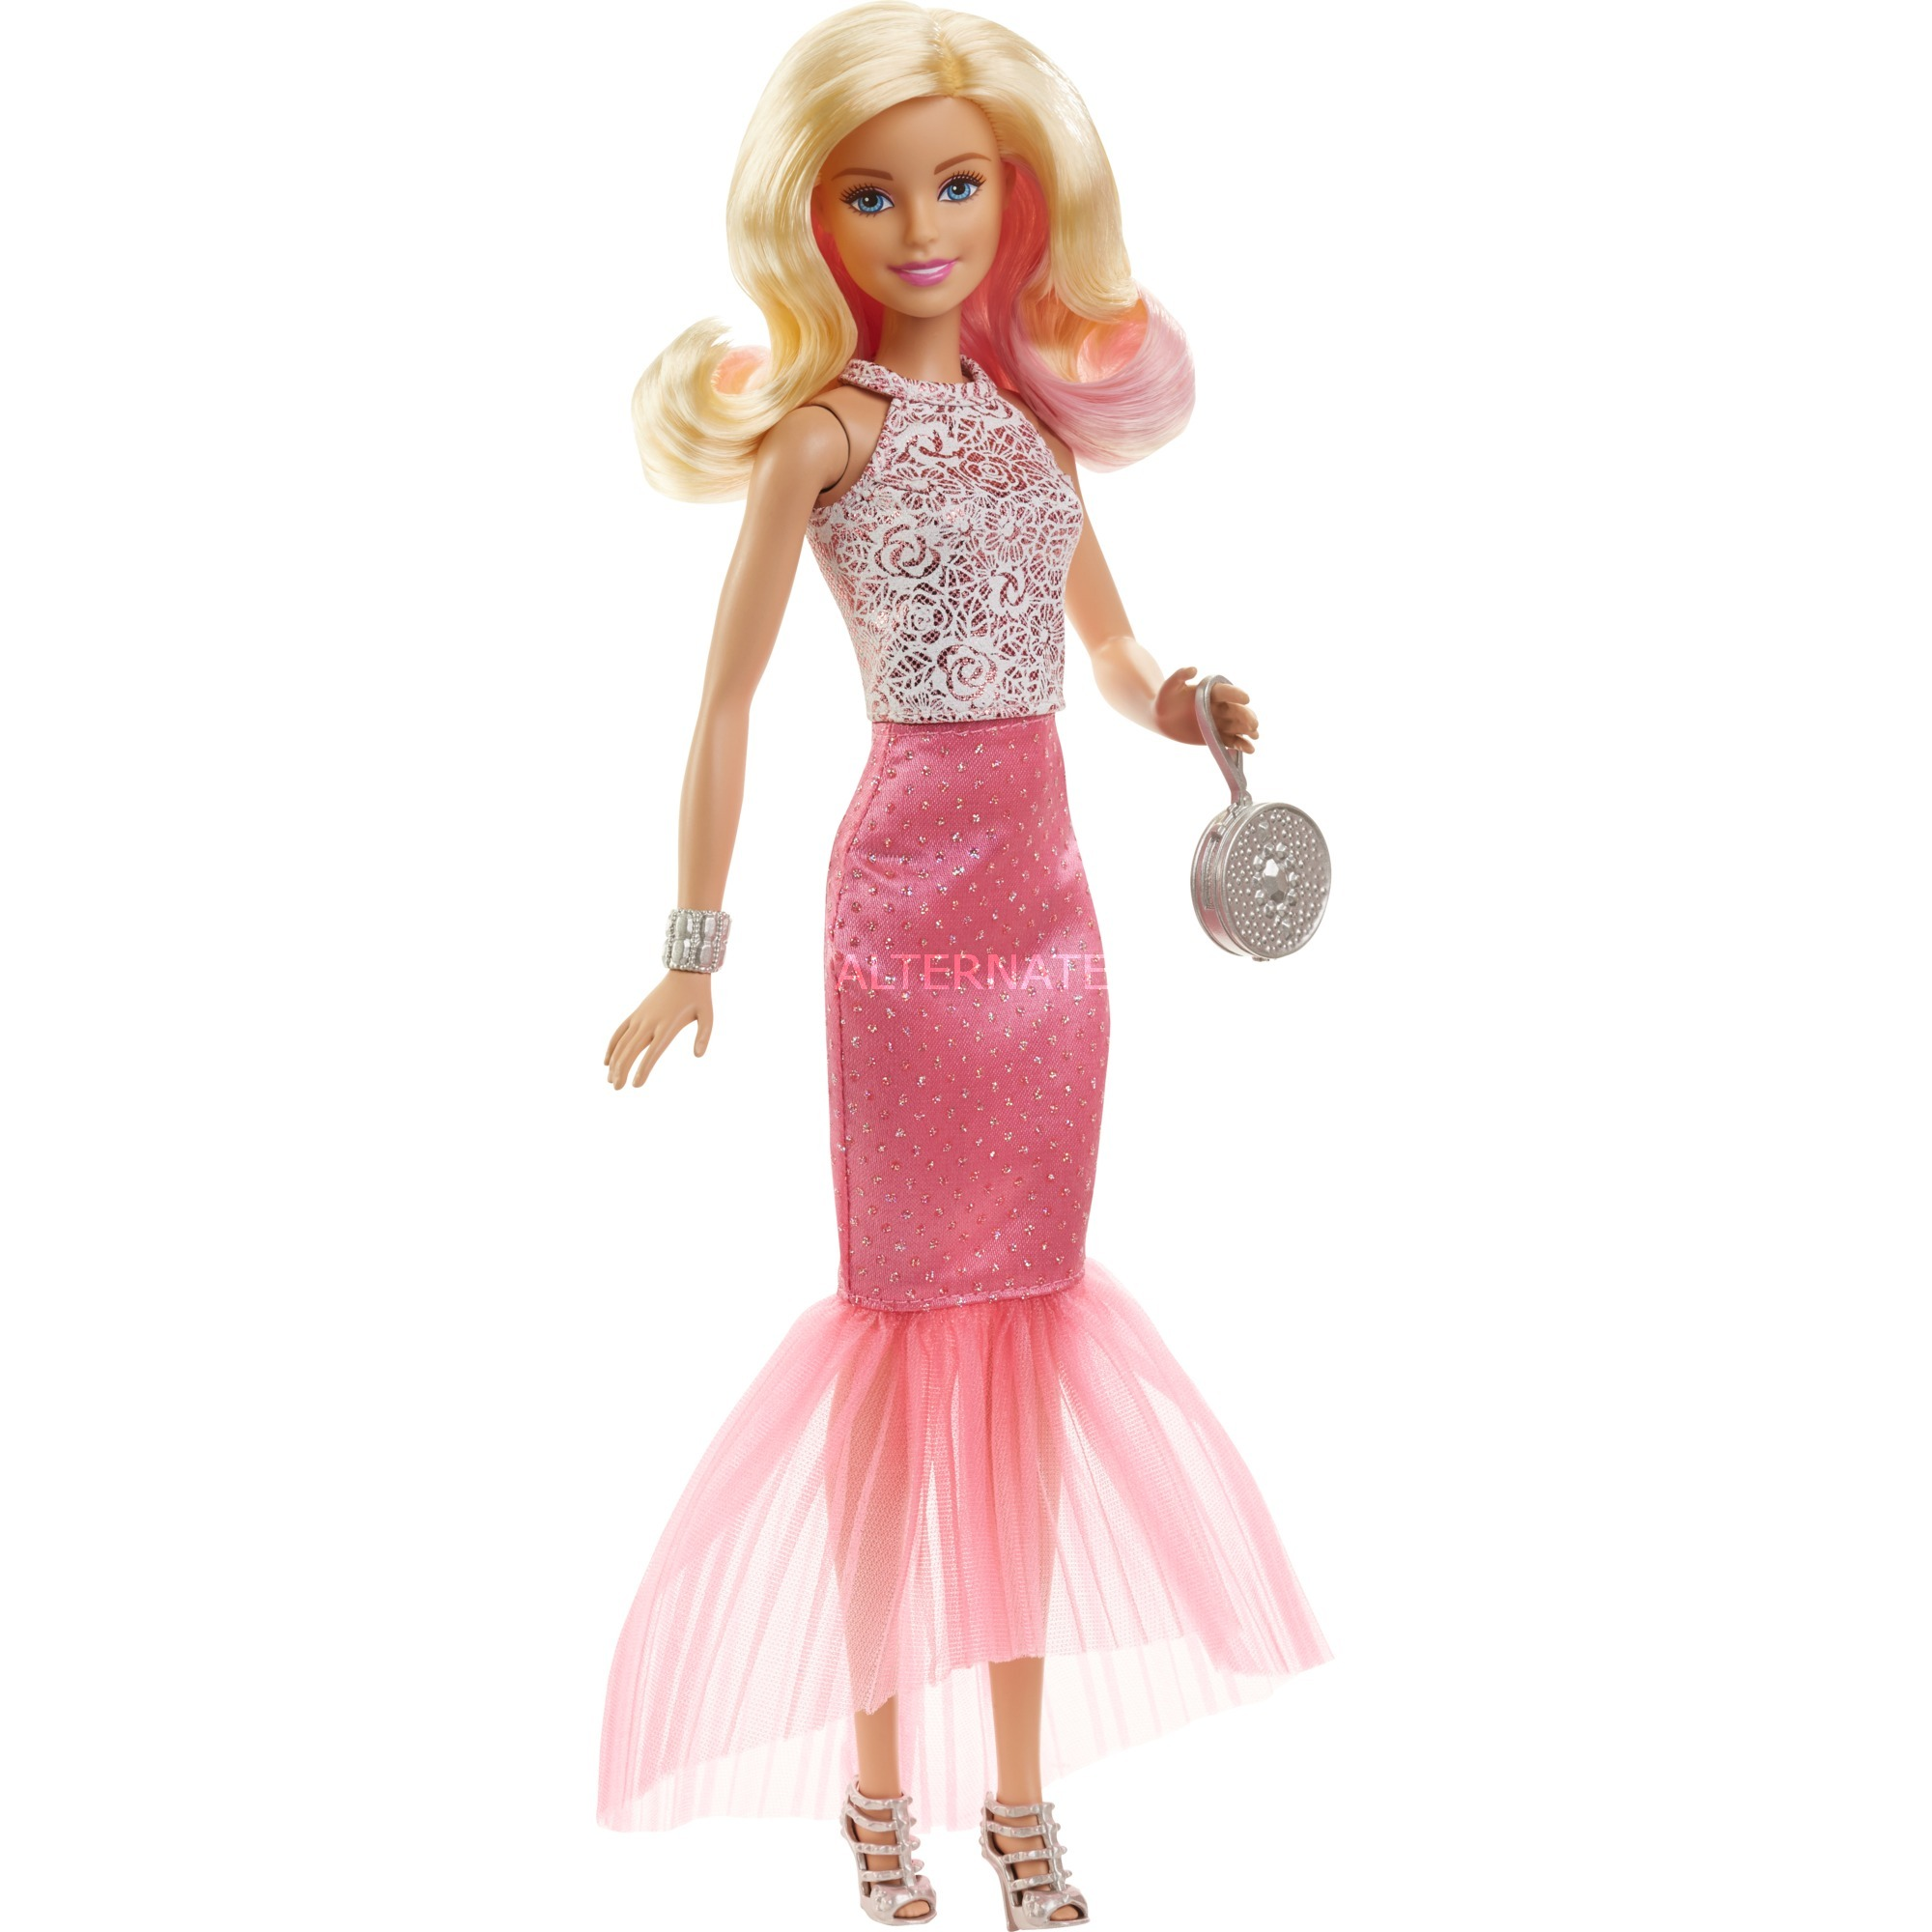 barbie-modedukke-med-pink-kjole-pop